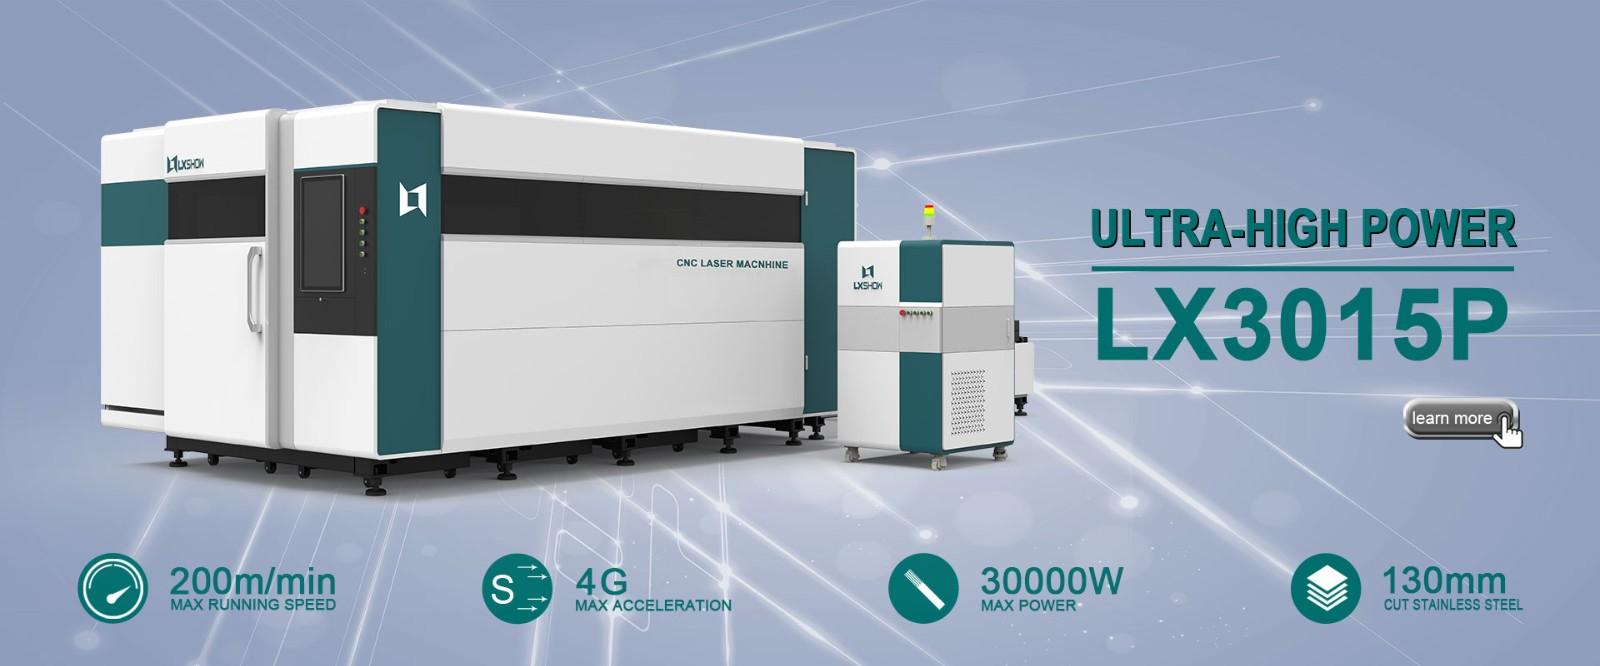 Laser Sheet Metal Cutter LX3015P